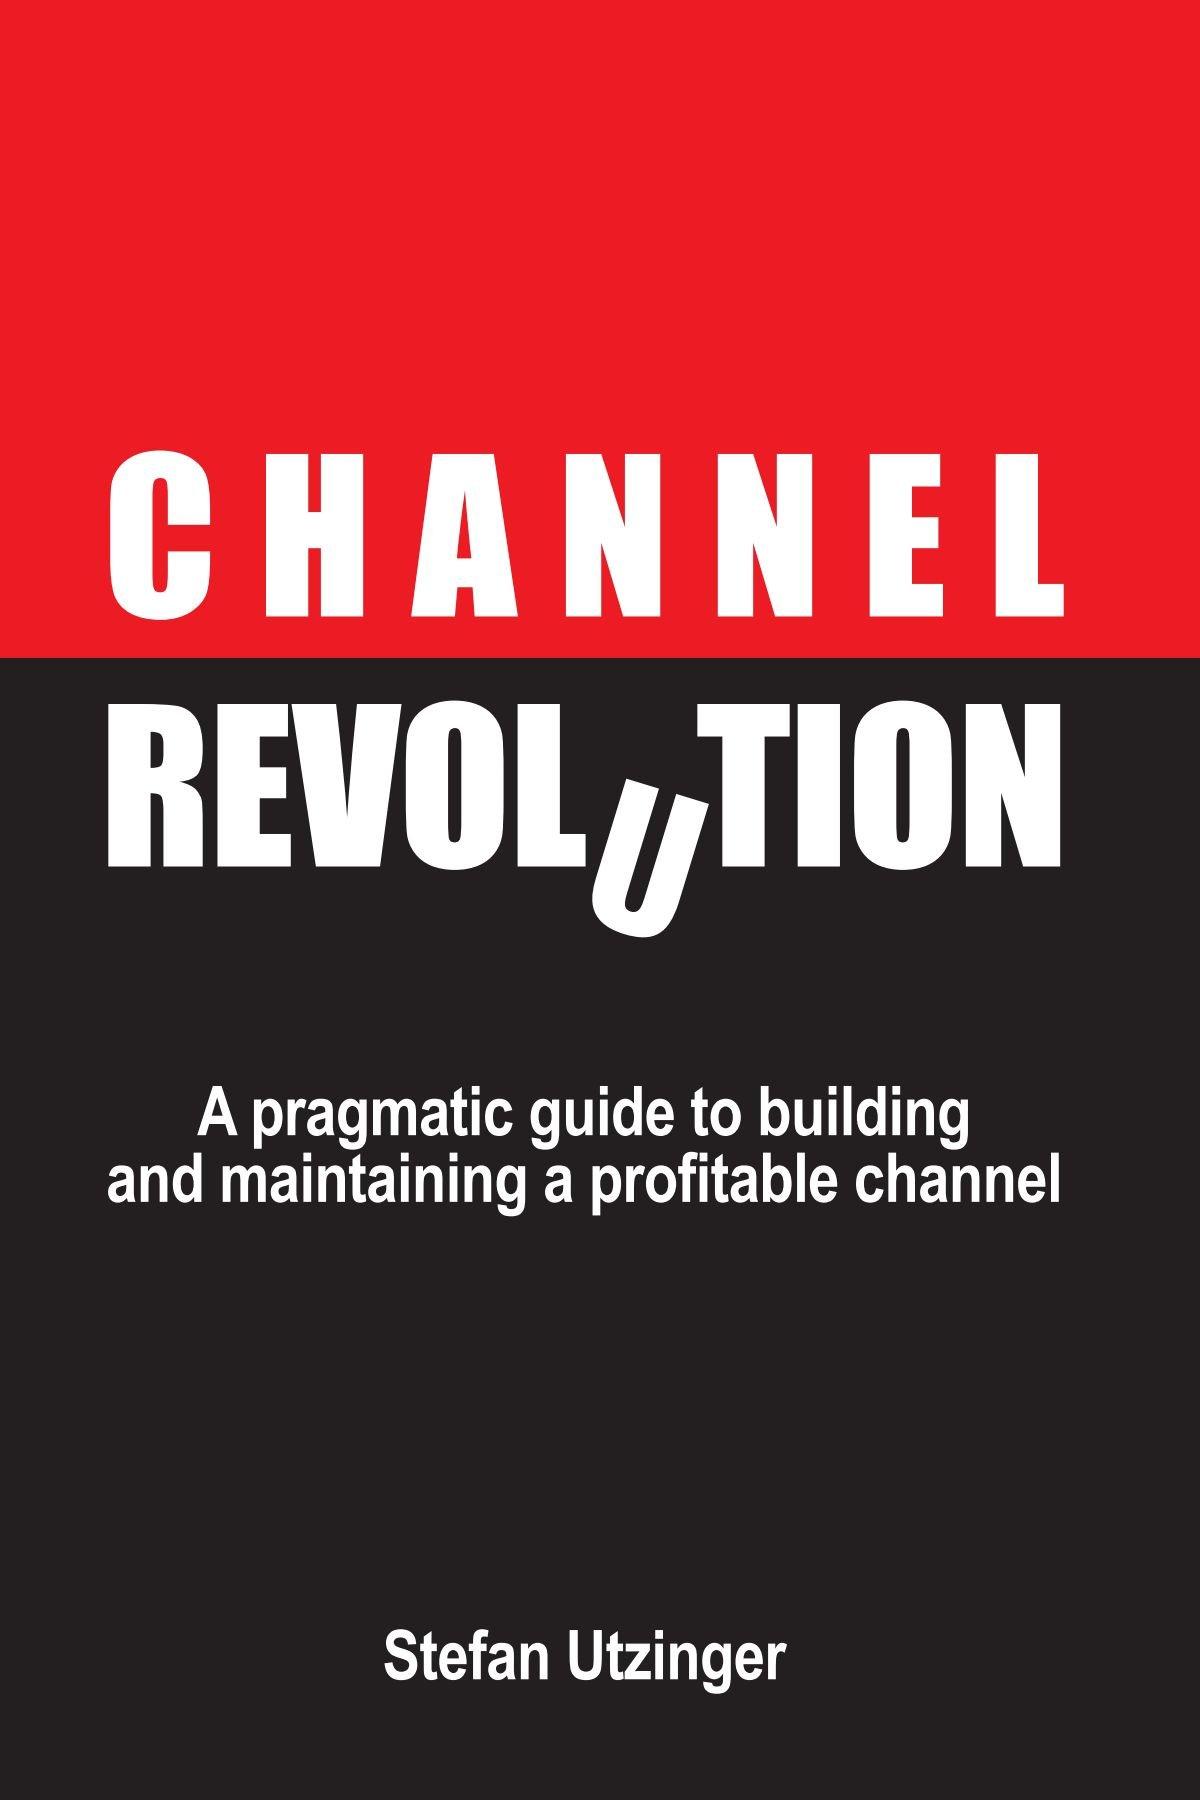 CHANNEL REVOLUTION pdf